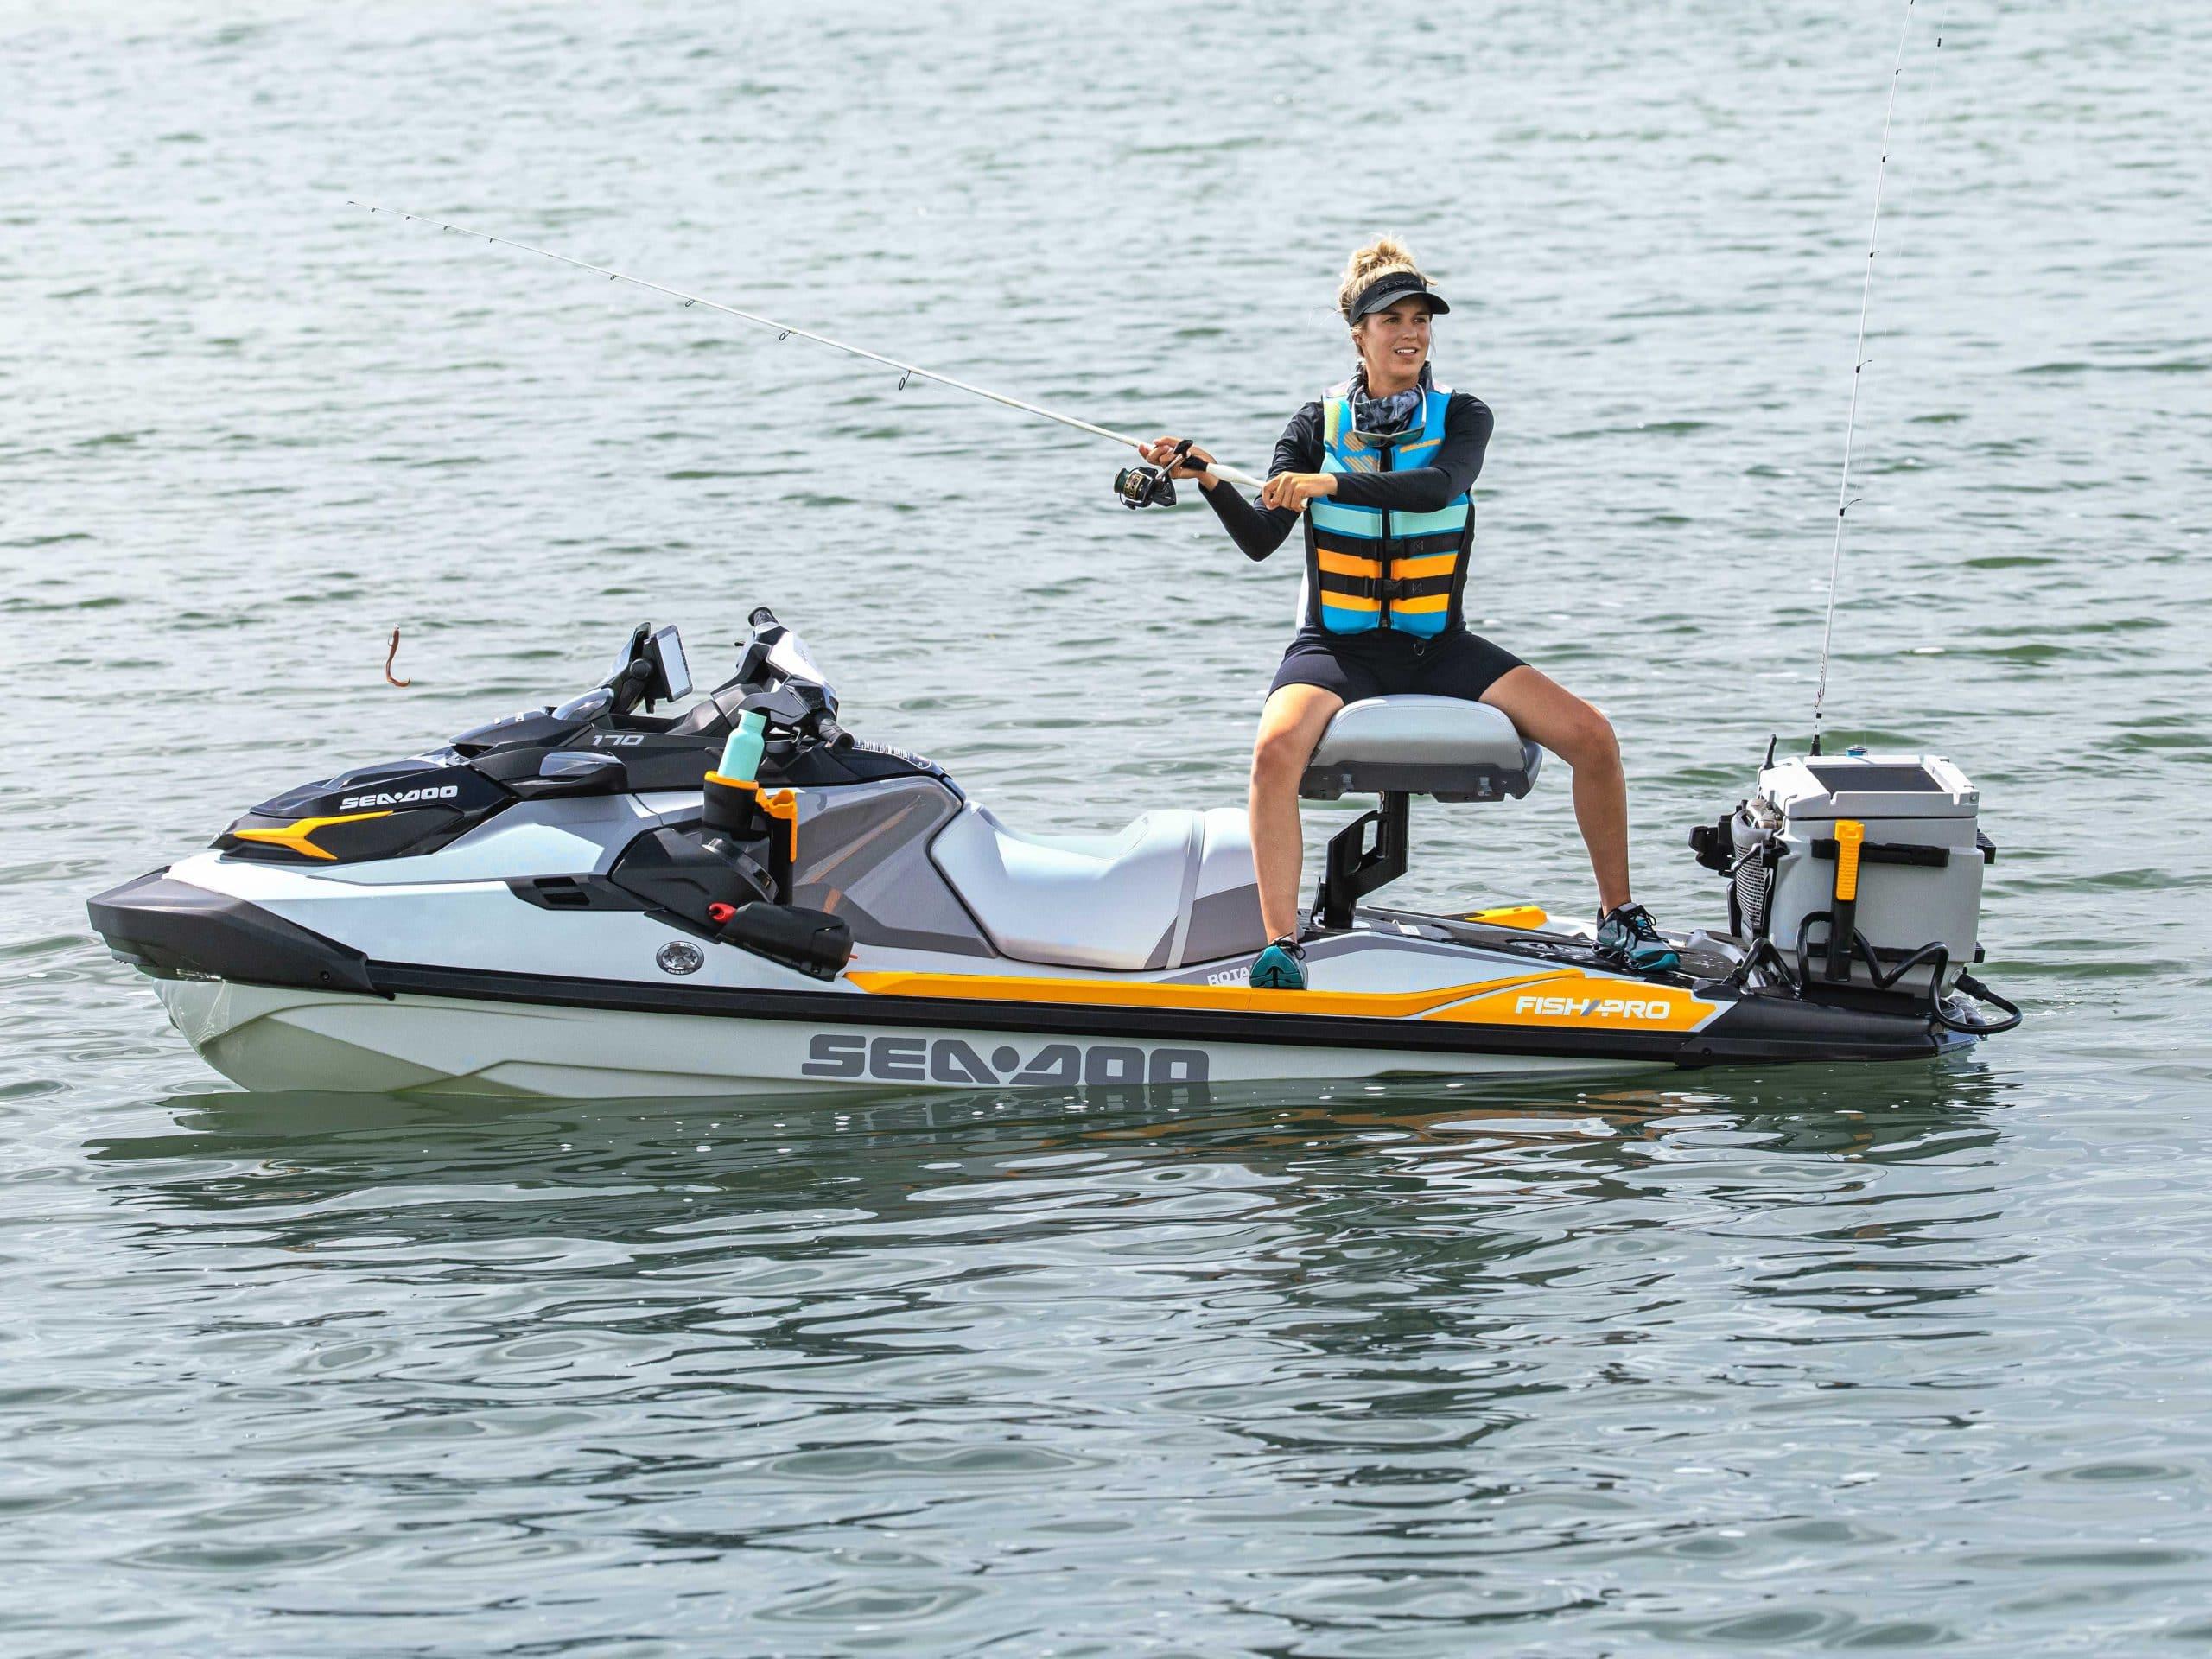 Le banc pivotant modulaire du FishPro Trophy. Source: https://www.sea-doo.com/ca/fr/modeles/sport-fishing/fishpro-trophy.html